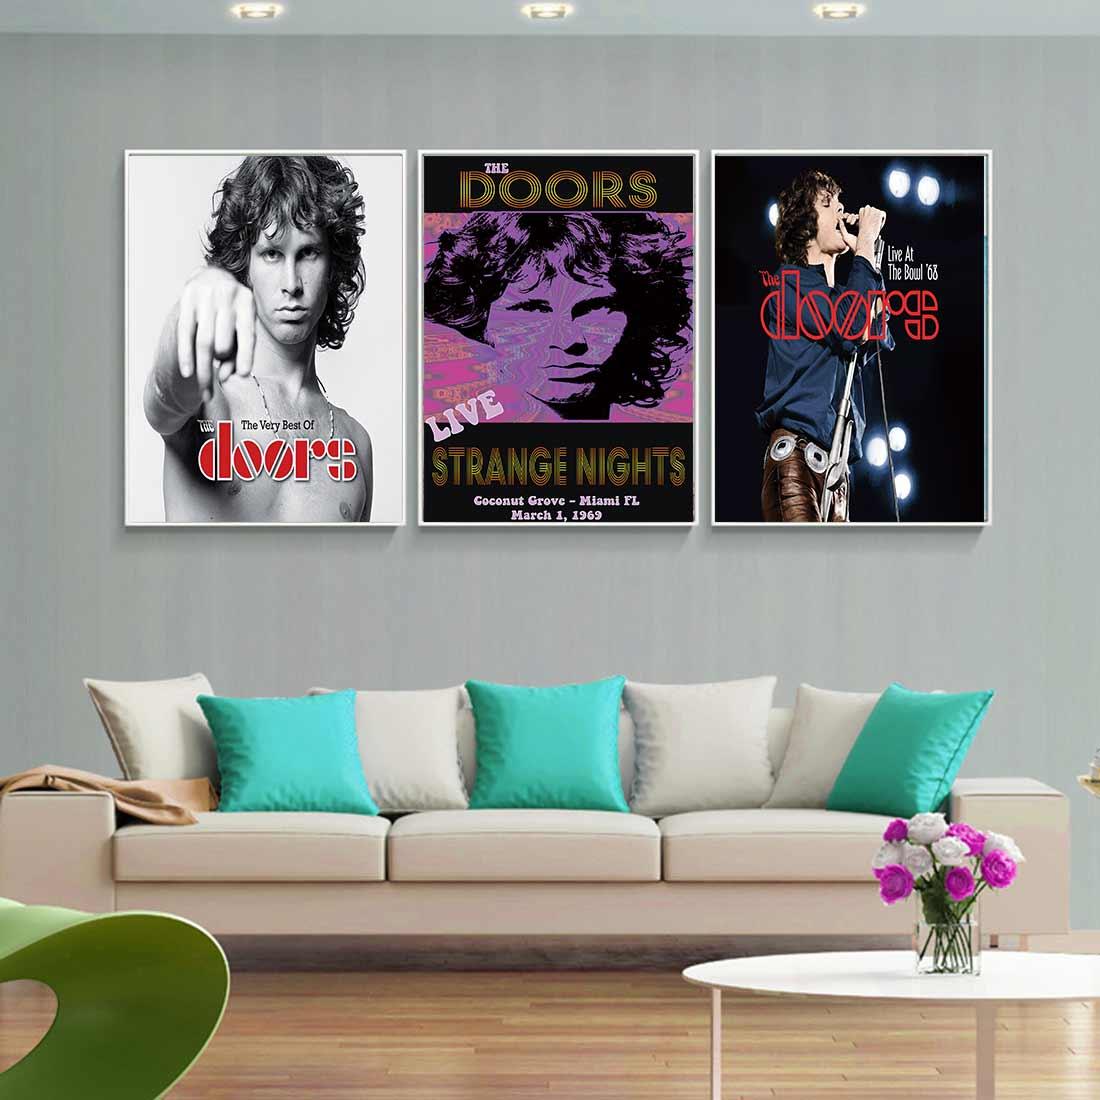 L142 The Doors Jim Morrison Rock Wall Art Decor Silk Poster Print Room Decoration Picture Gift Canvas Custom 24x36' 12x18'